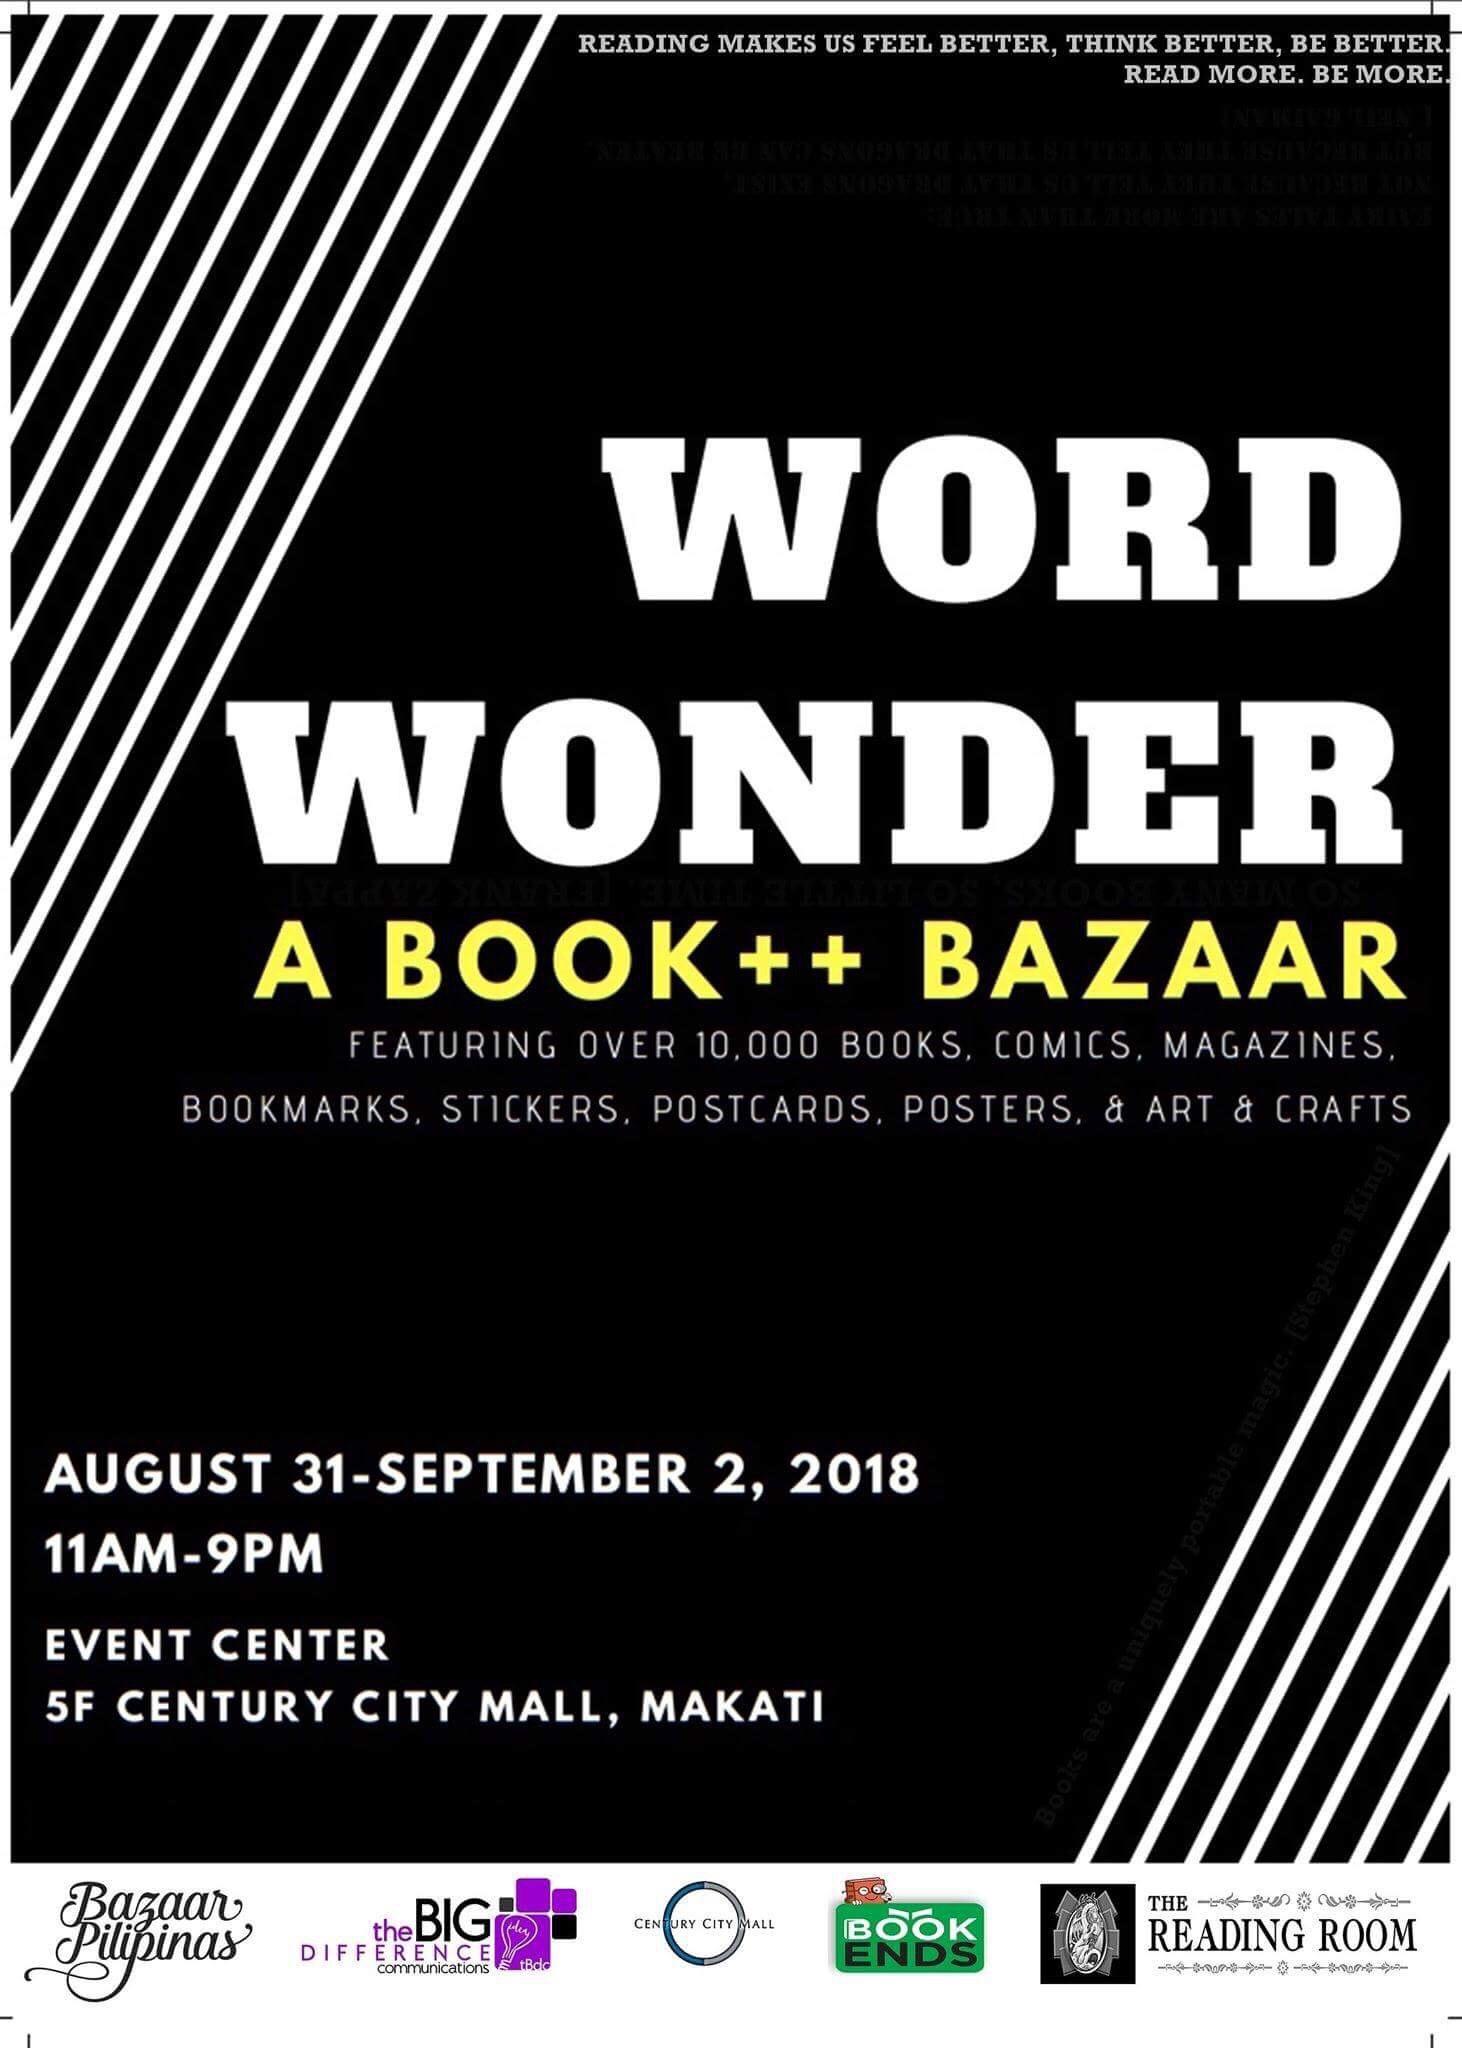 Word Wonder: A Book++ Bazaar